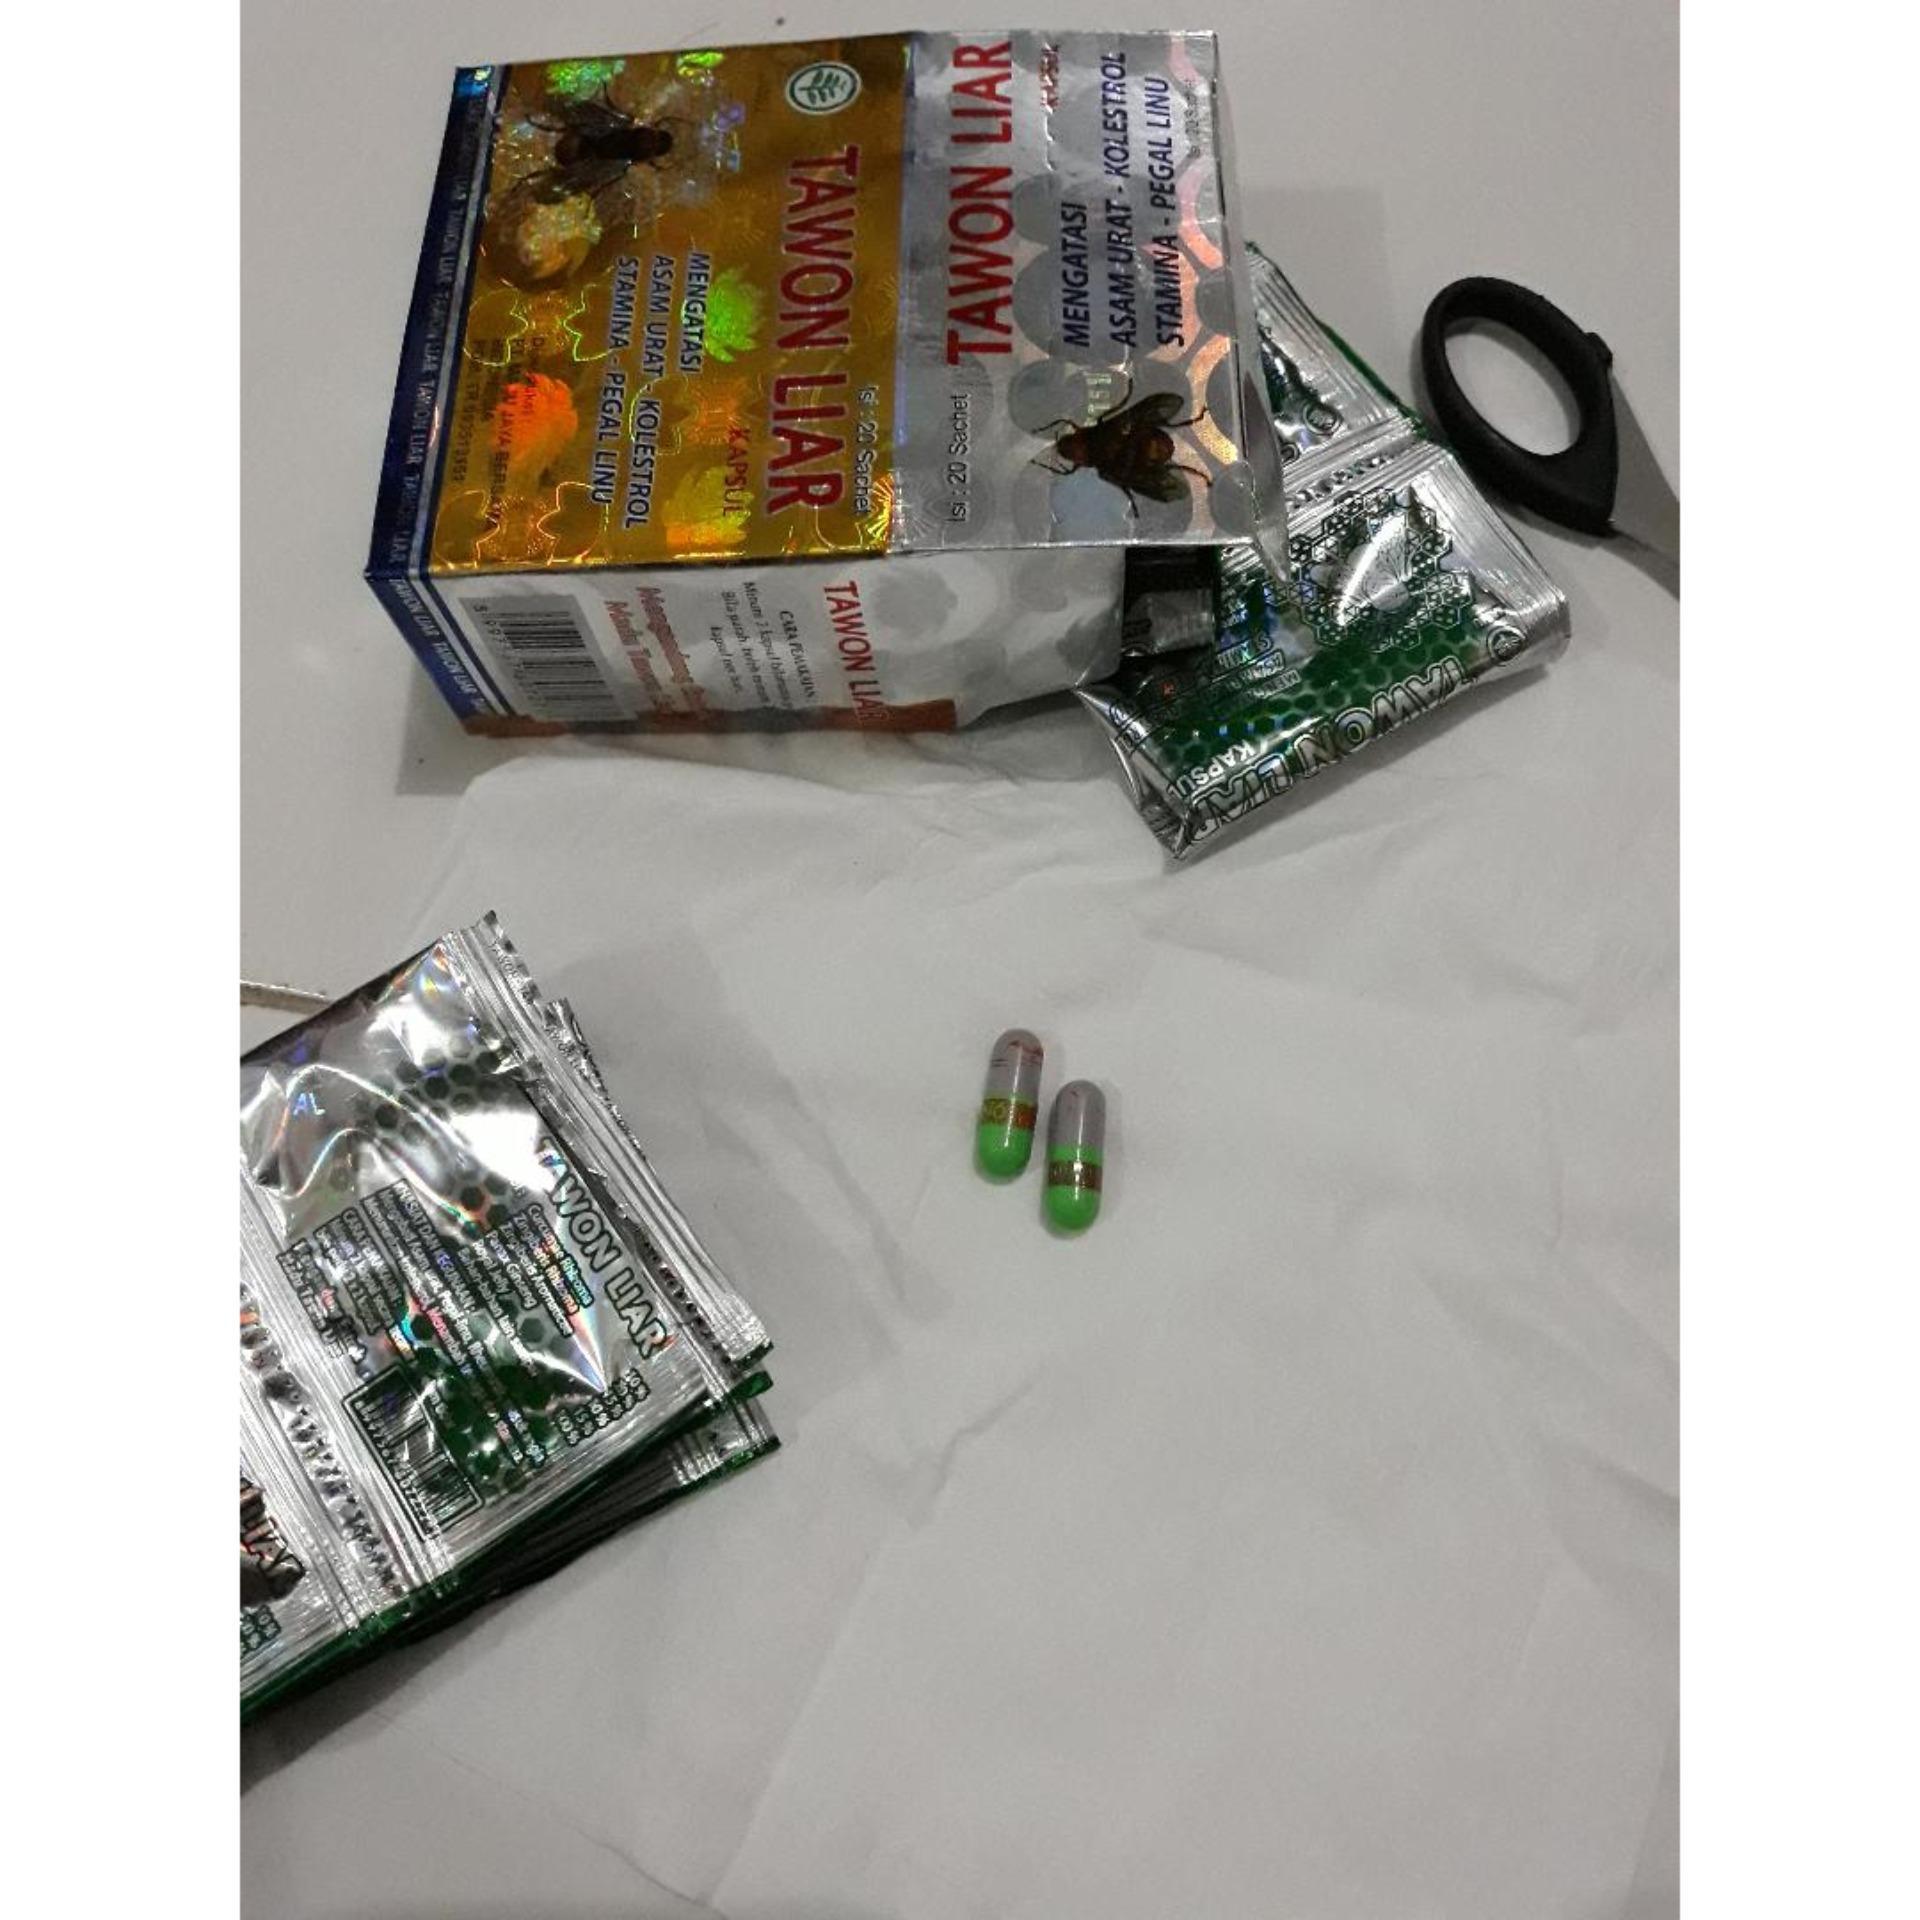 10 BOX-Tawon Liar Capsul-Sachet Hijau Silver.Box HOLOGRAM.IDR400000. Rp 800.000